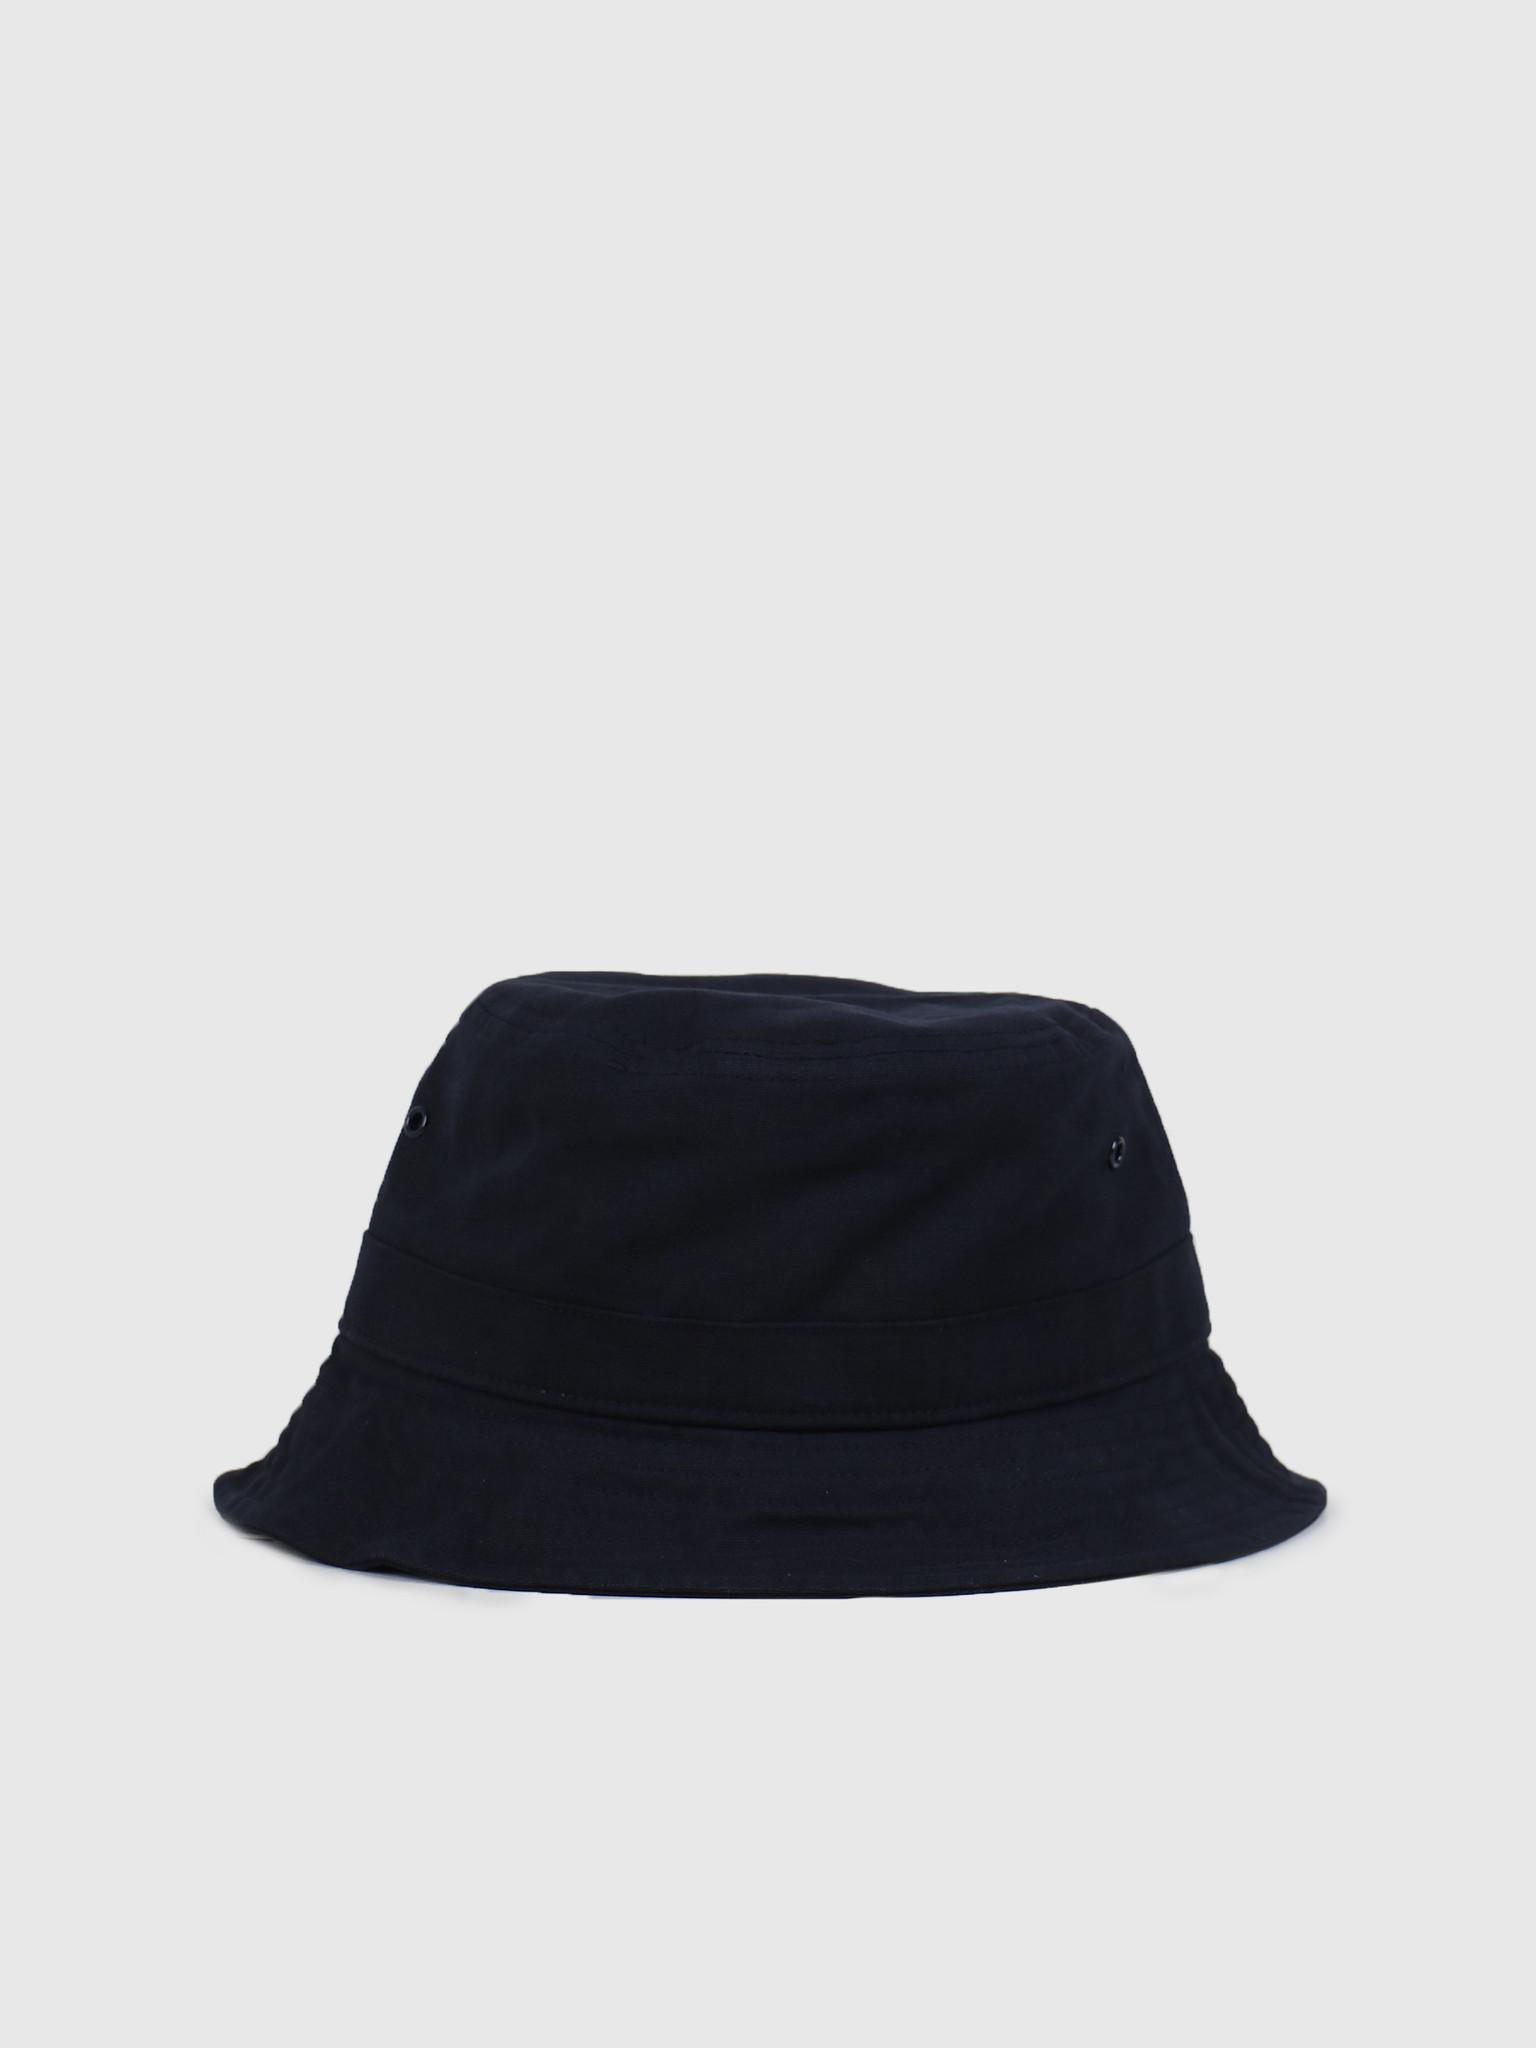 Carhartt WIP Carhartt WIP Script Bucket Hat Dark Navy White I026217-1C90